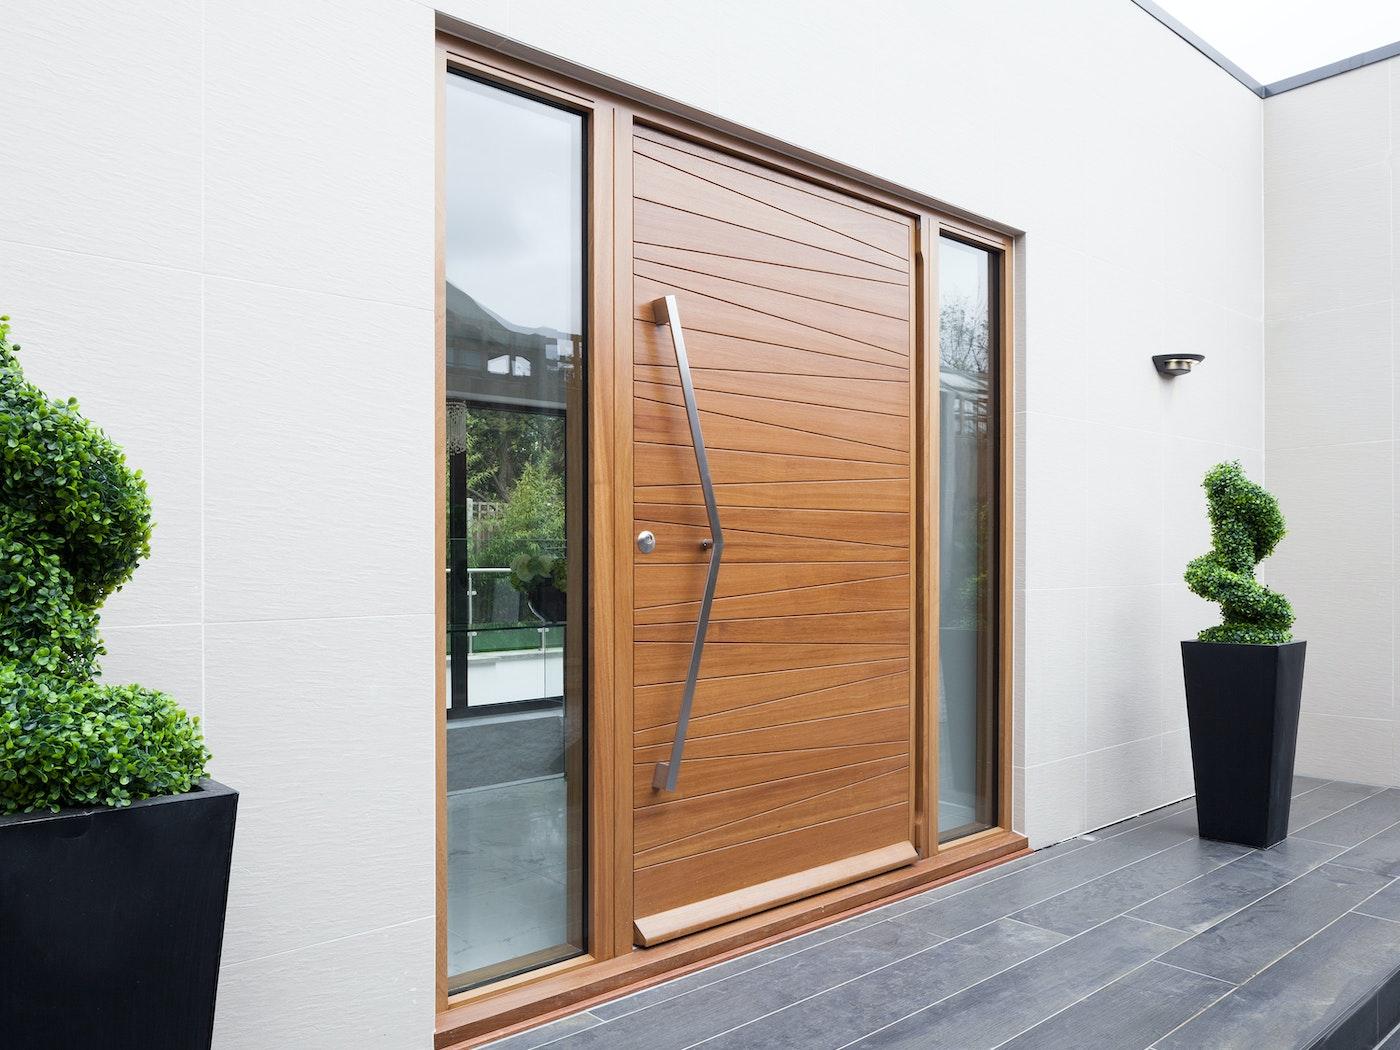 This zig zag handle is a great combination with the door design